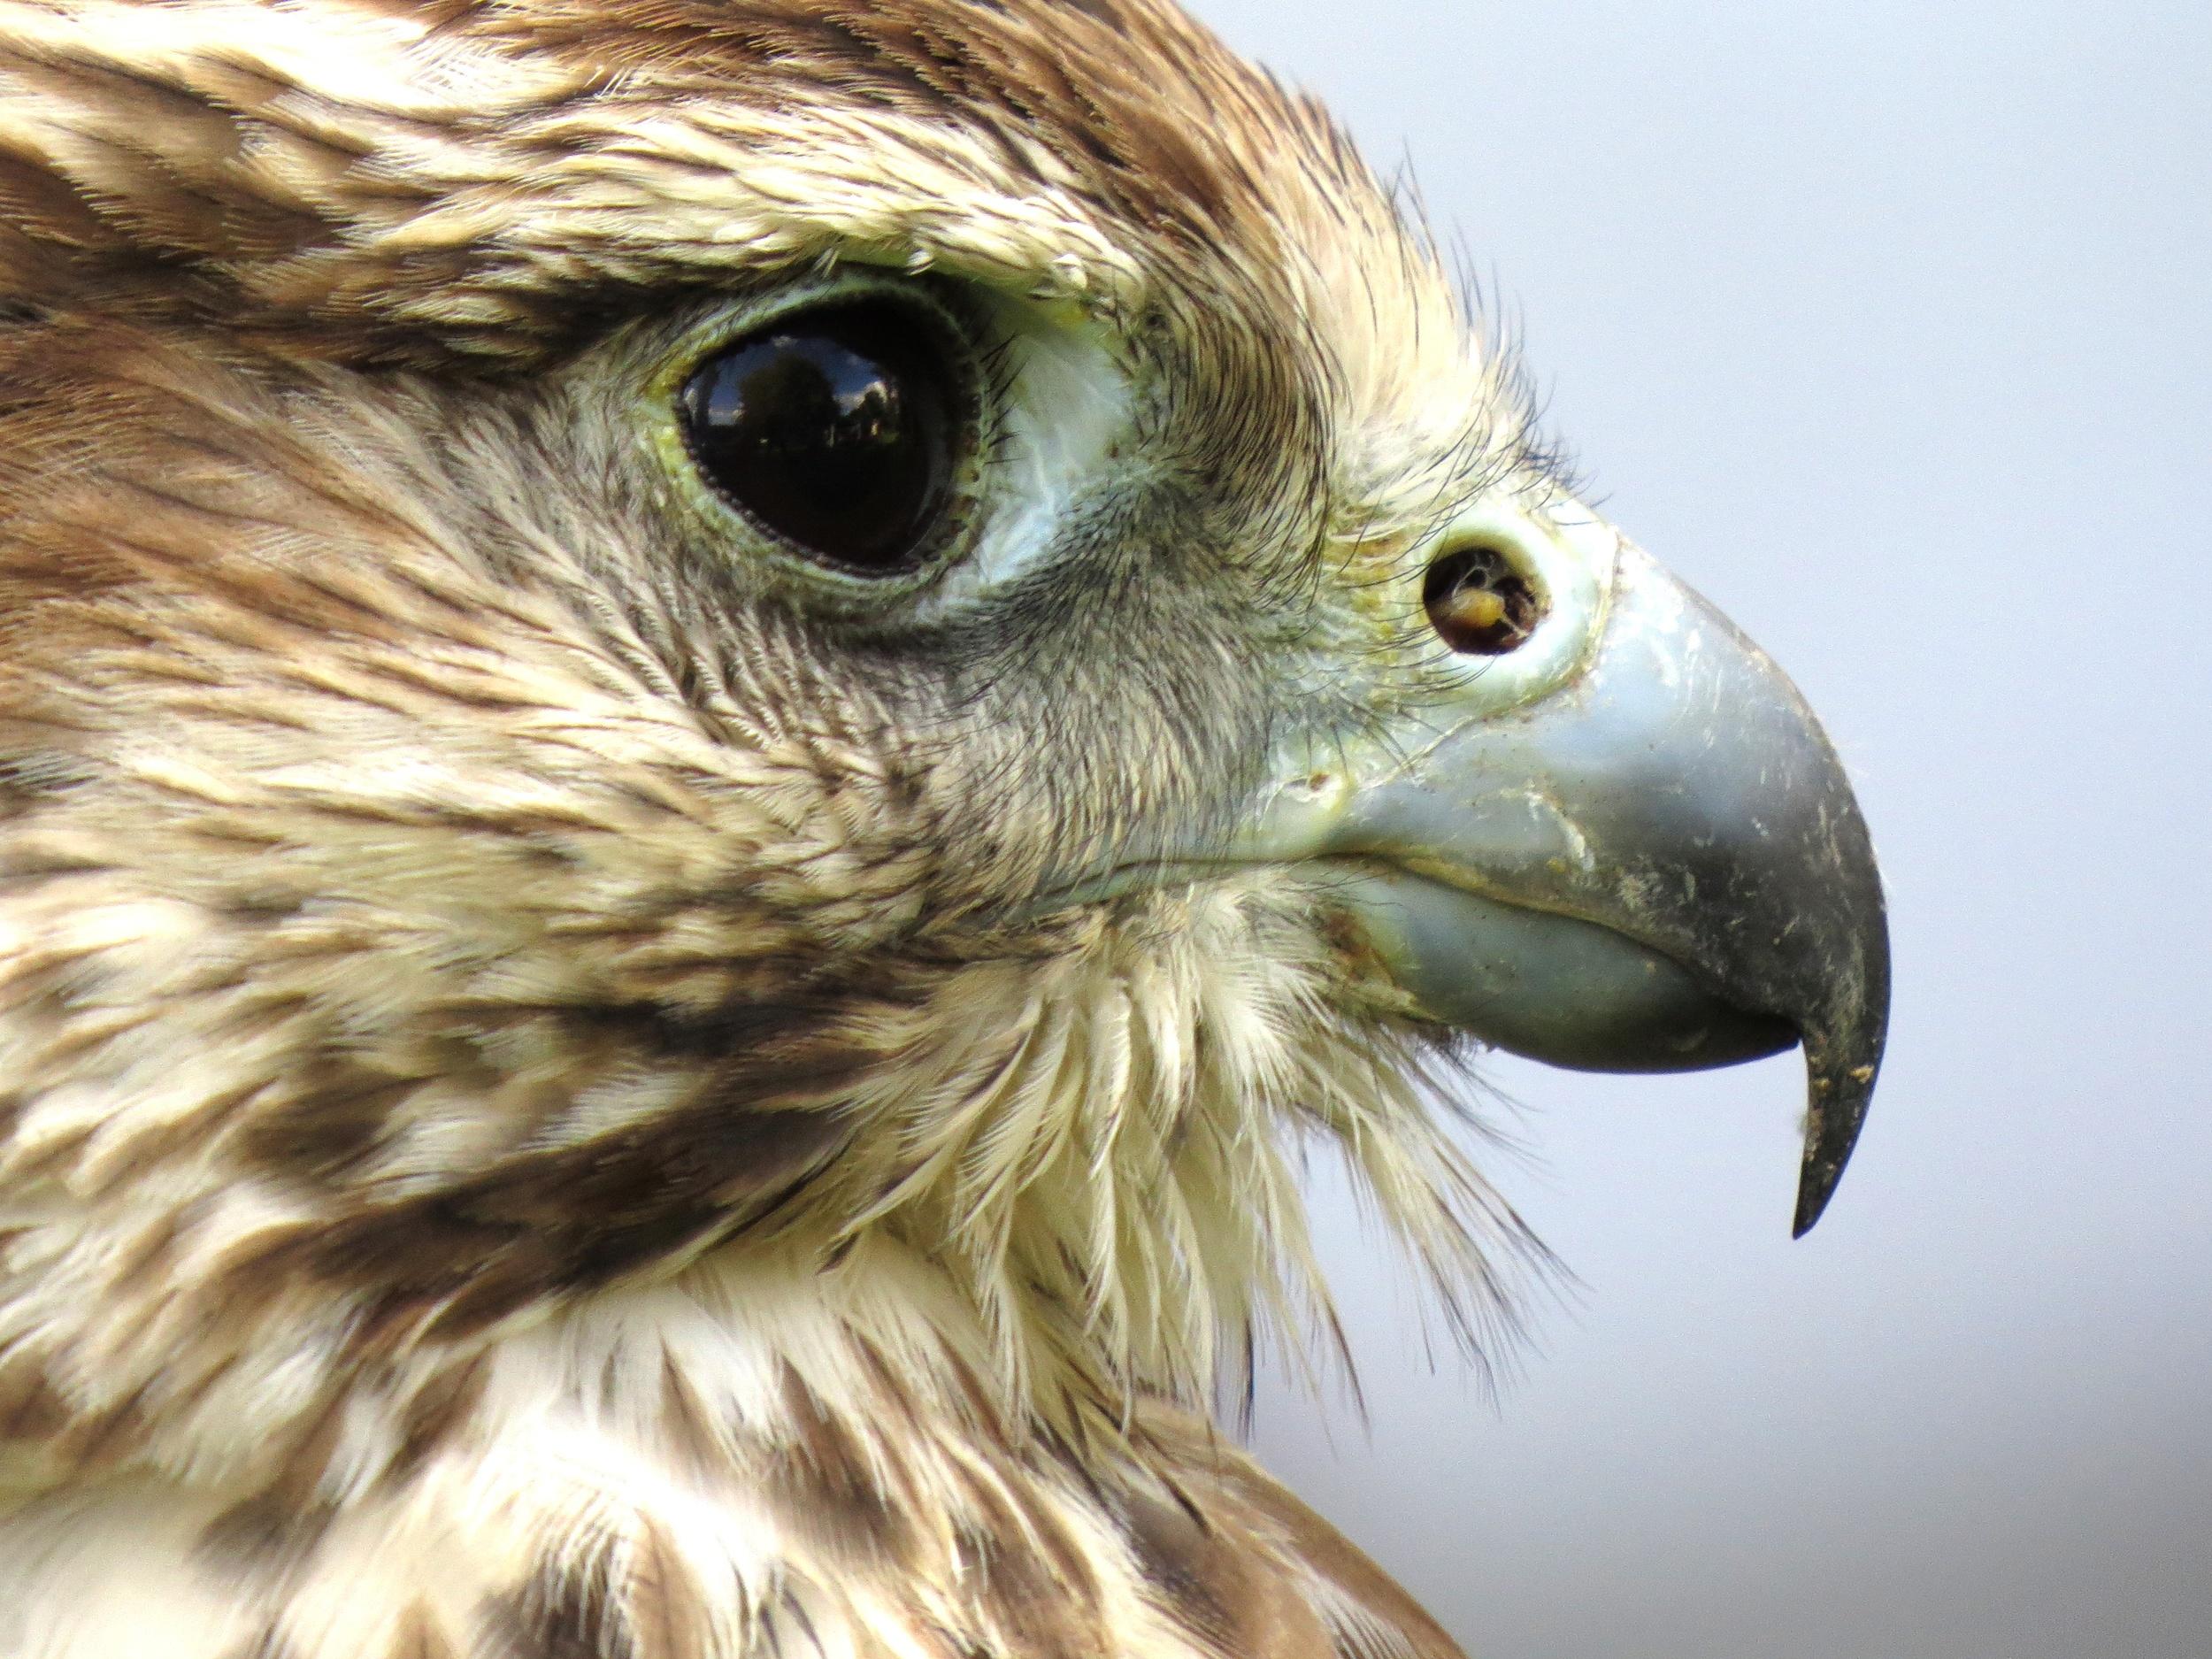 roland kirk eagle profile cW Up.jpeg